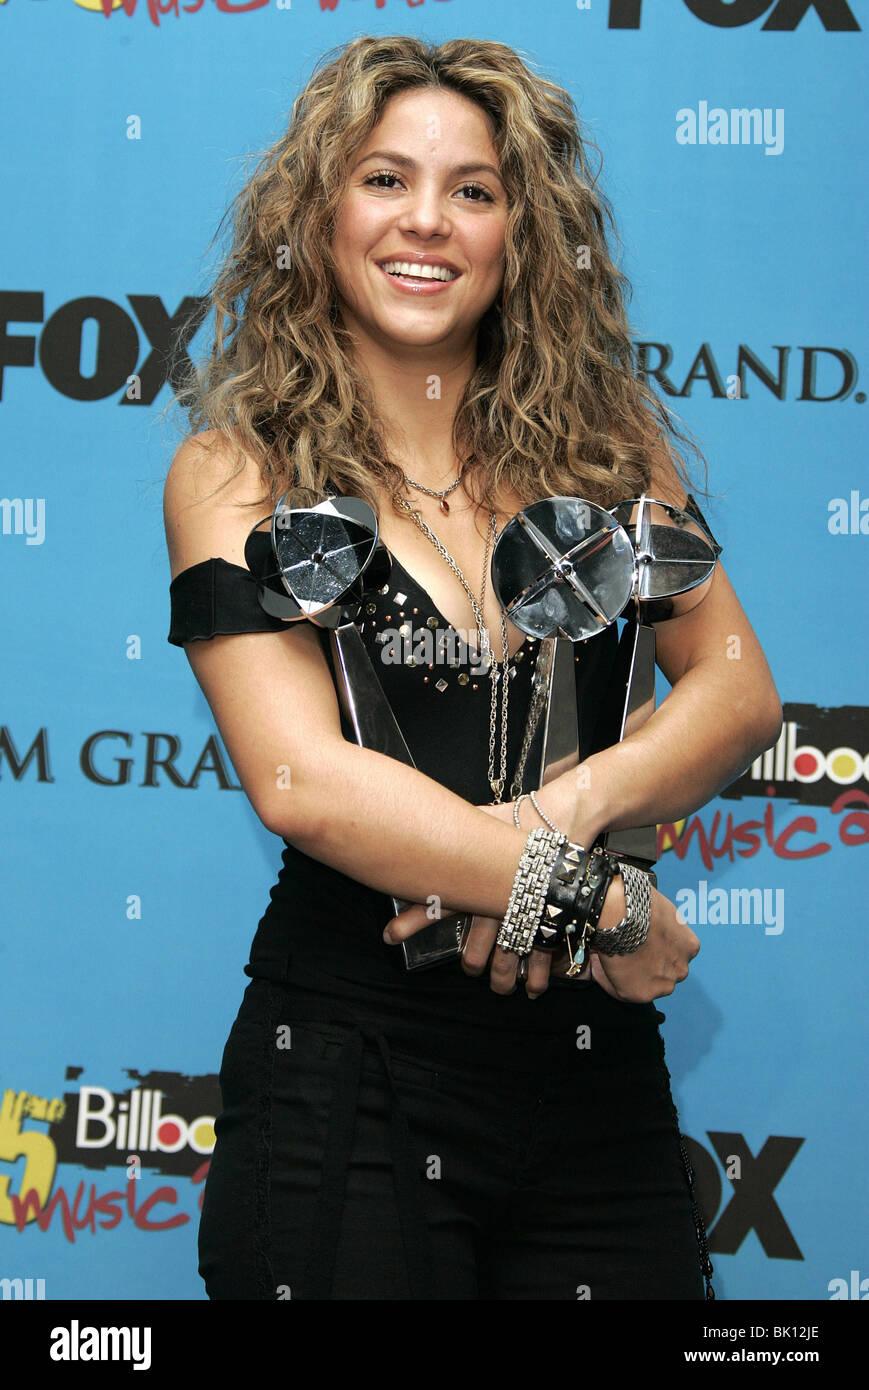 SHAKIRA BILLBOARD MUSIC AWARDS 05 MGM GRAND ARENA LAS VEGAS USA 06 December 2005 - Stock Image